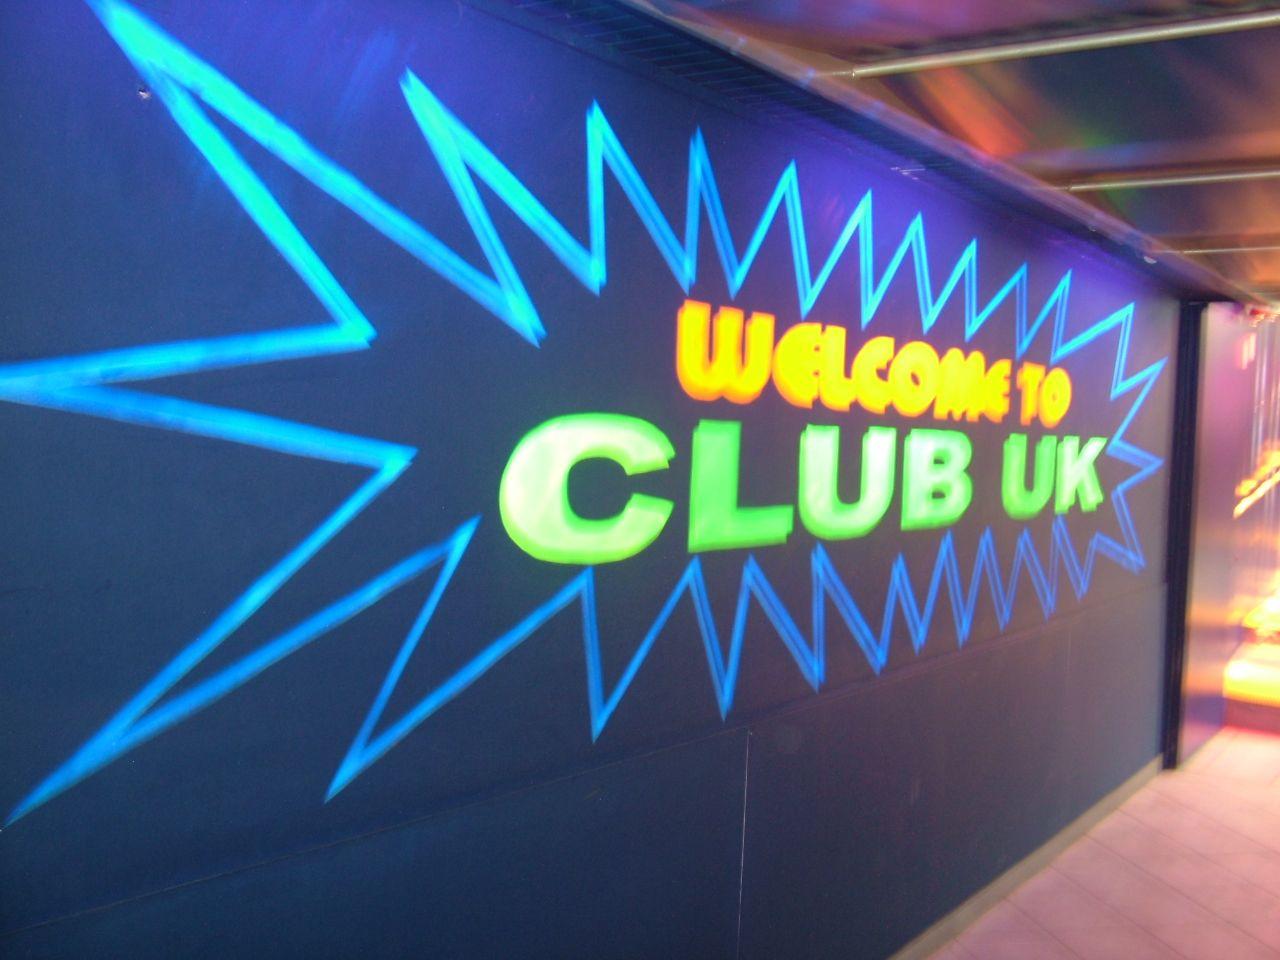 Club UK,